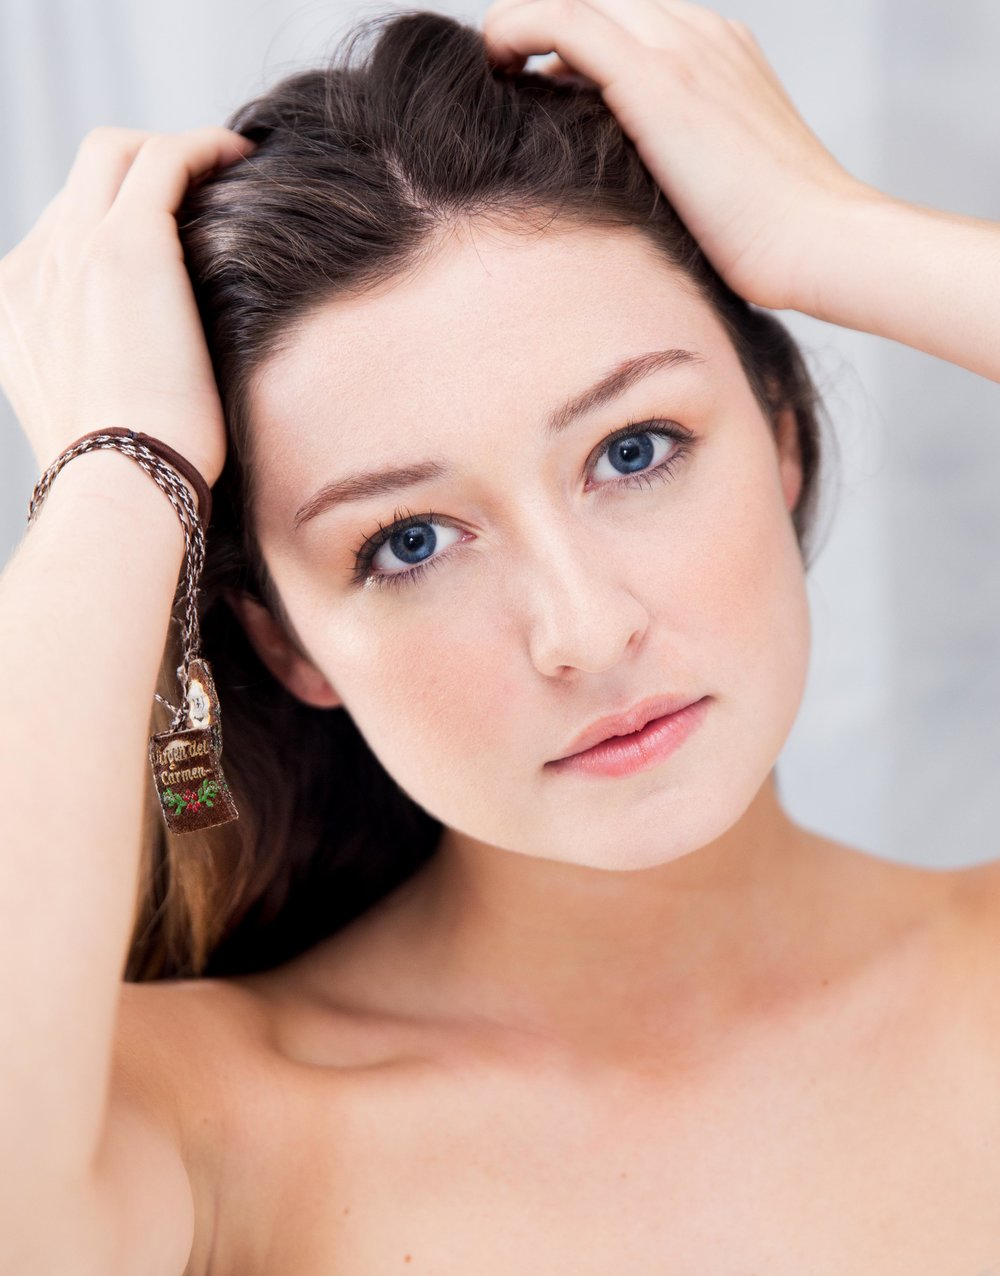 Modeling for Pavlina Popovska. MUA: Tonii Scott.